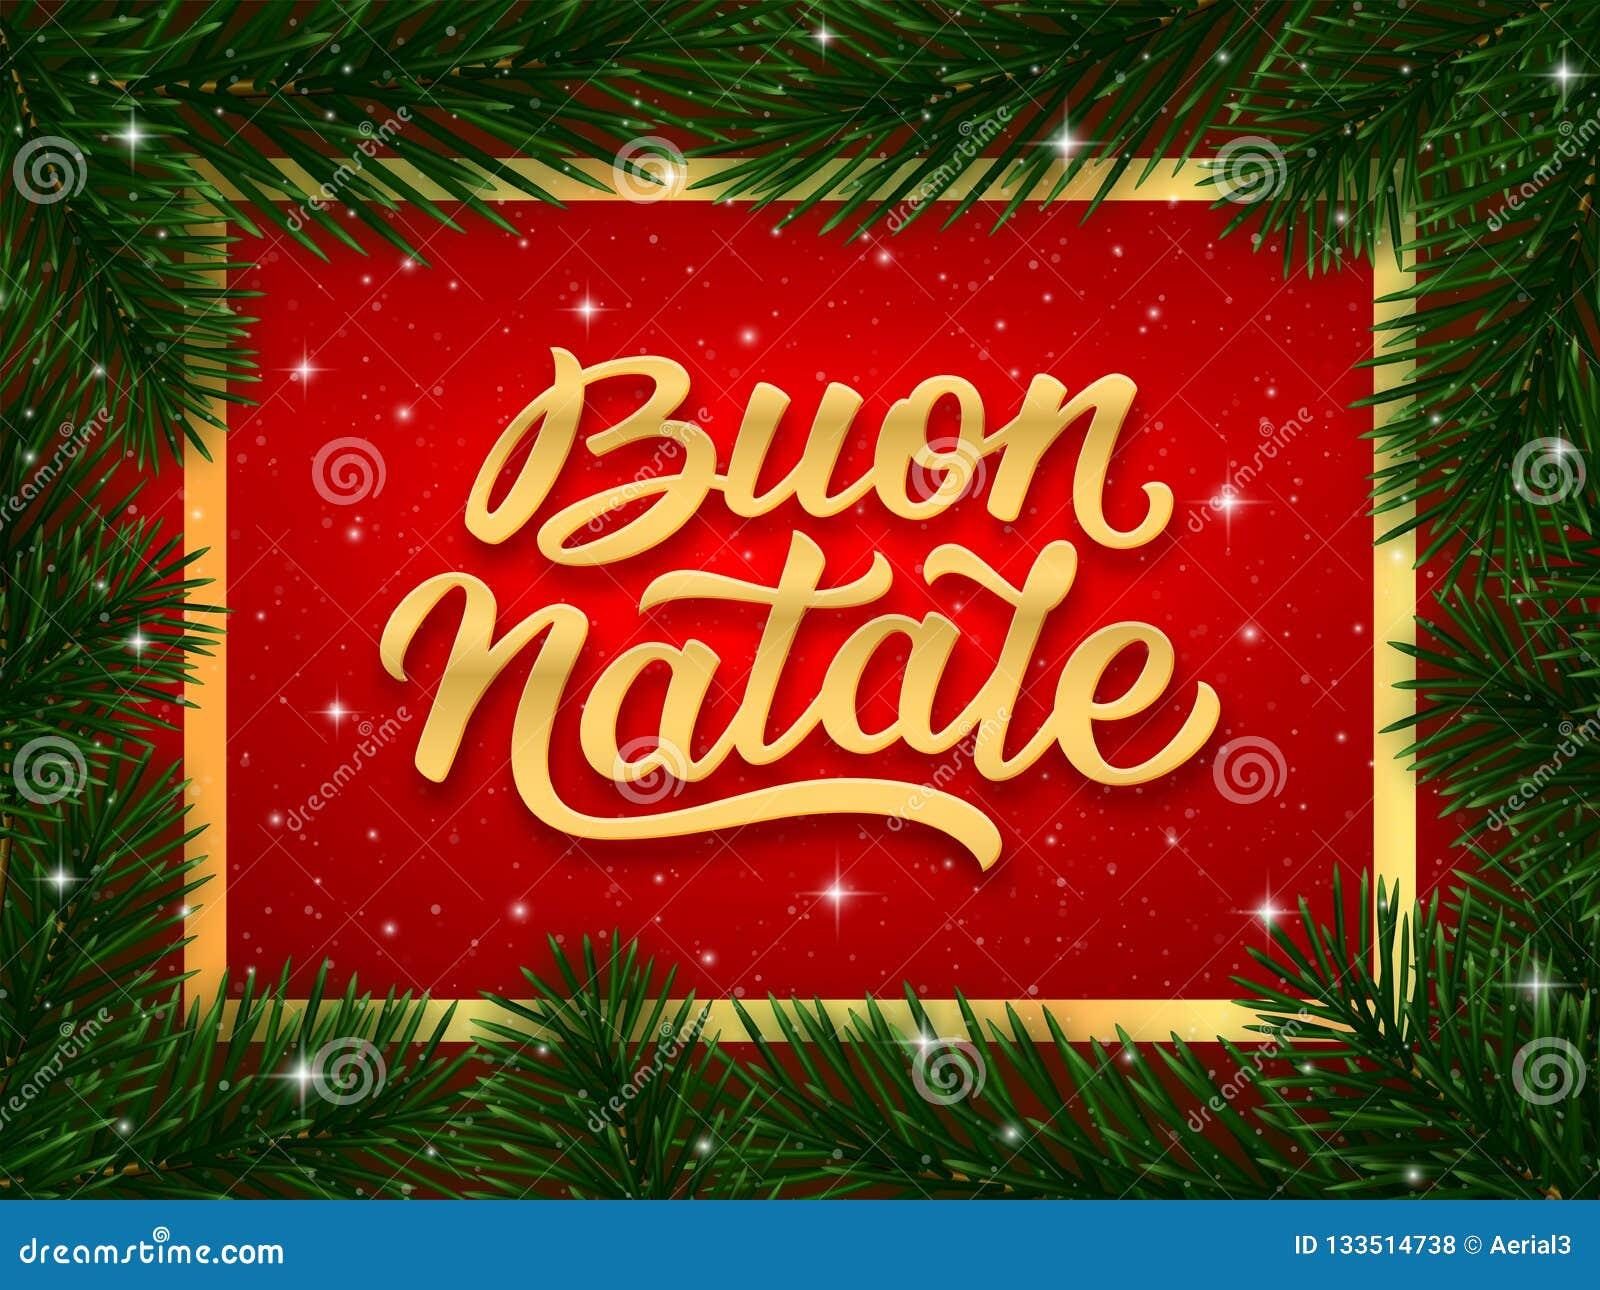 Buon Natale Ornament.Merry Christmas Card Design With Italian Text Stock Vector